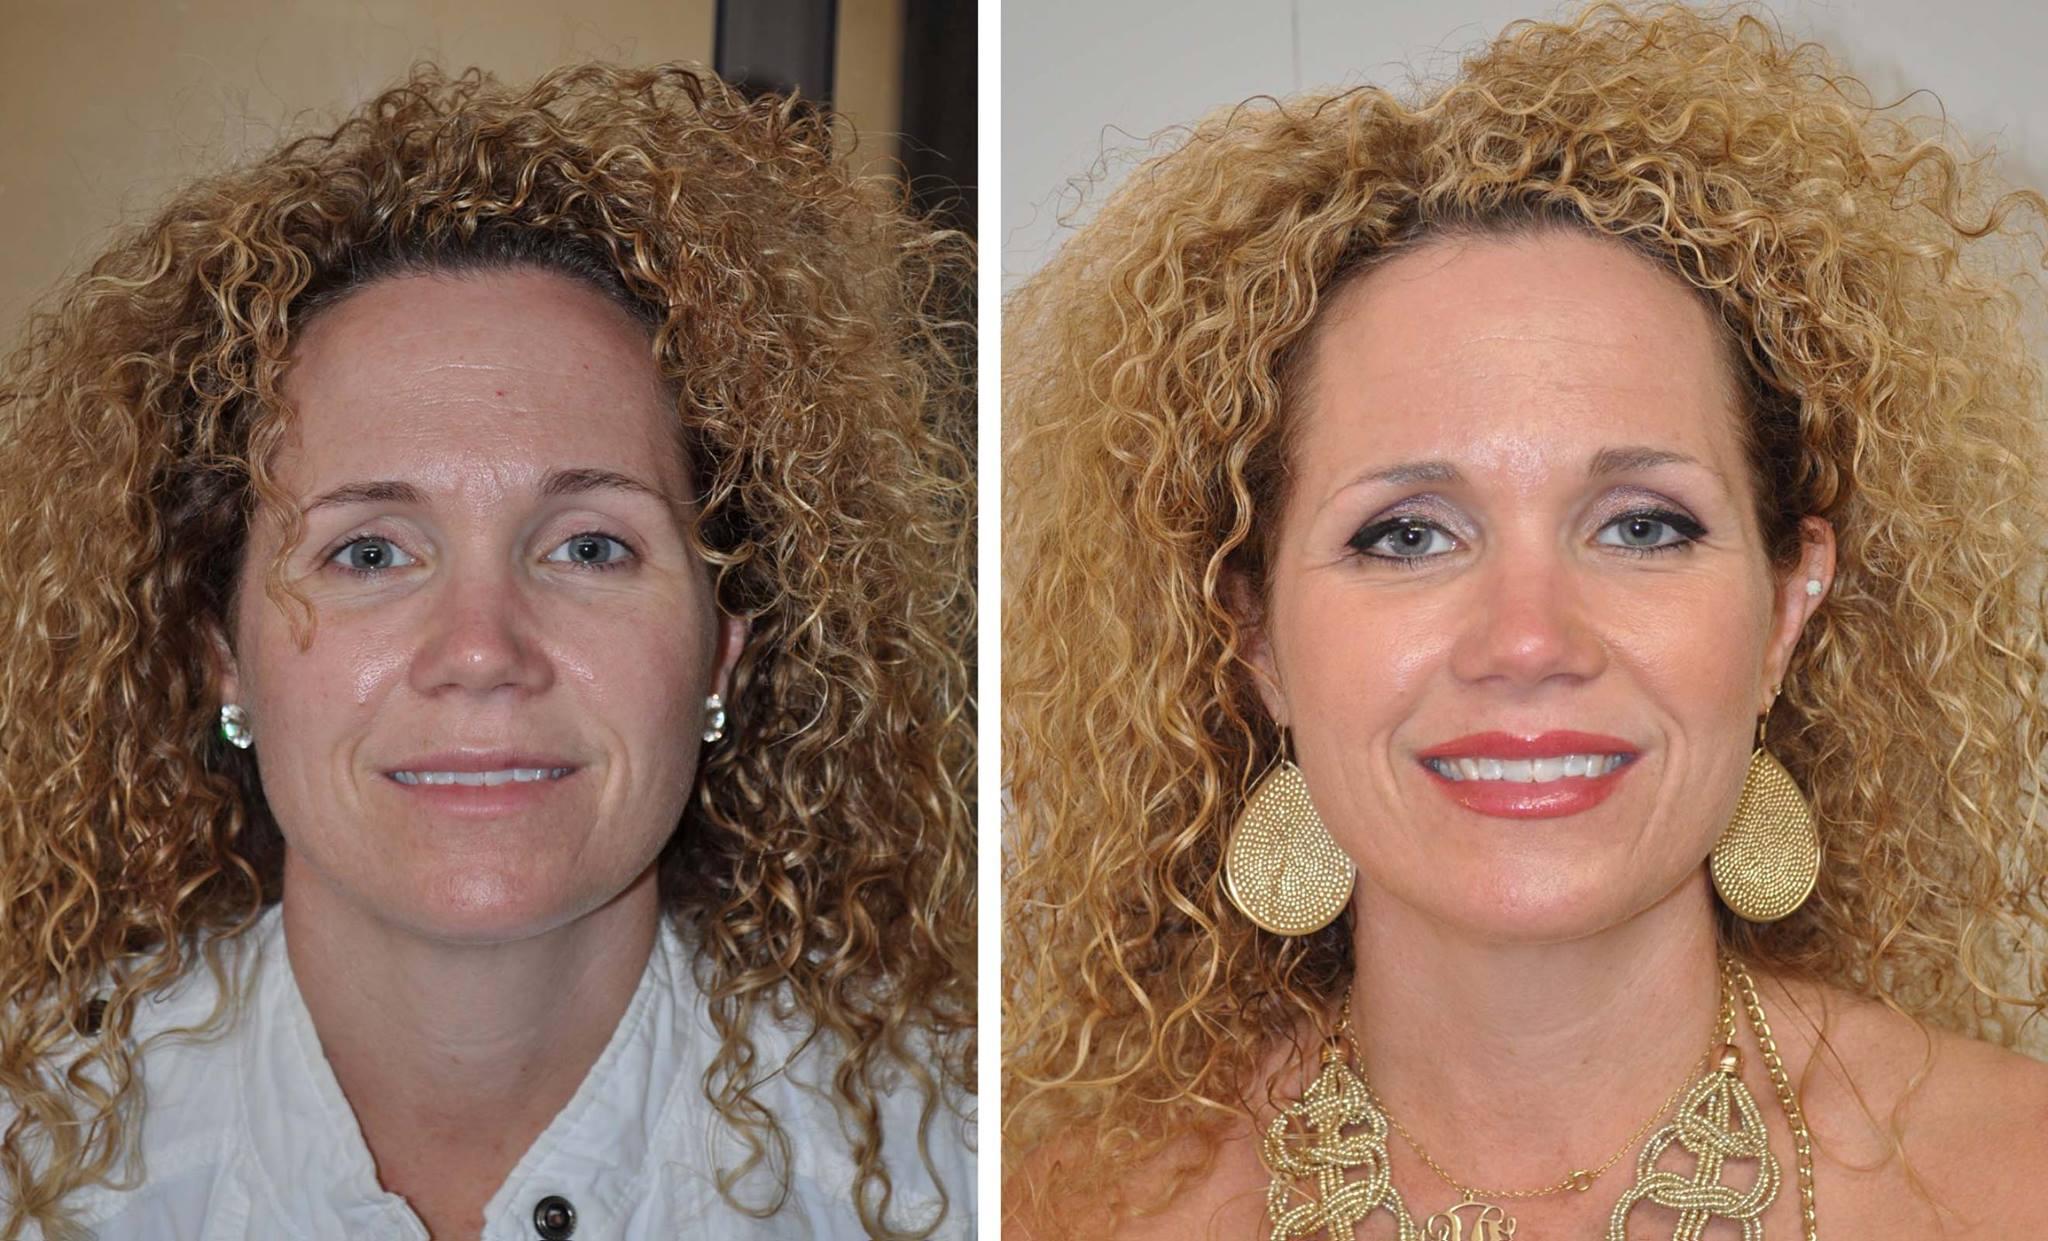 Before, Healed Lips and Eyeliner